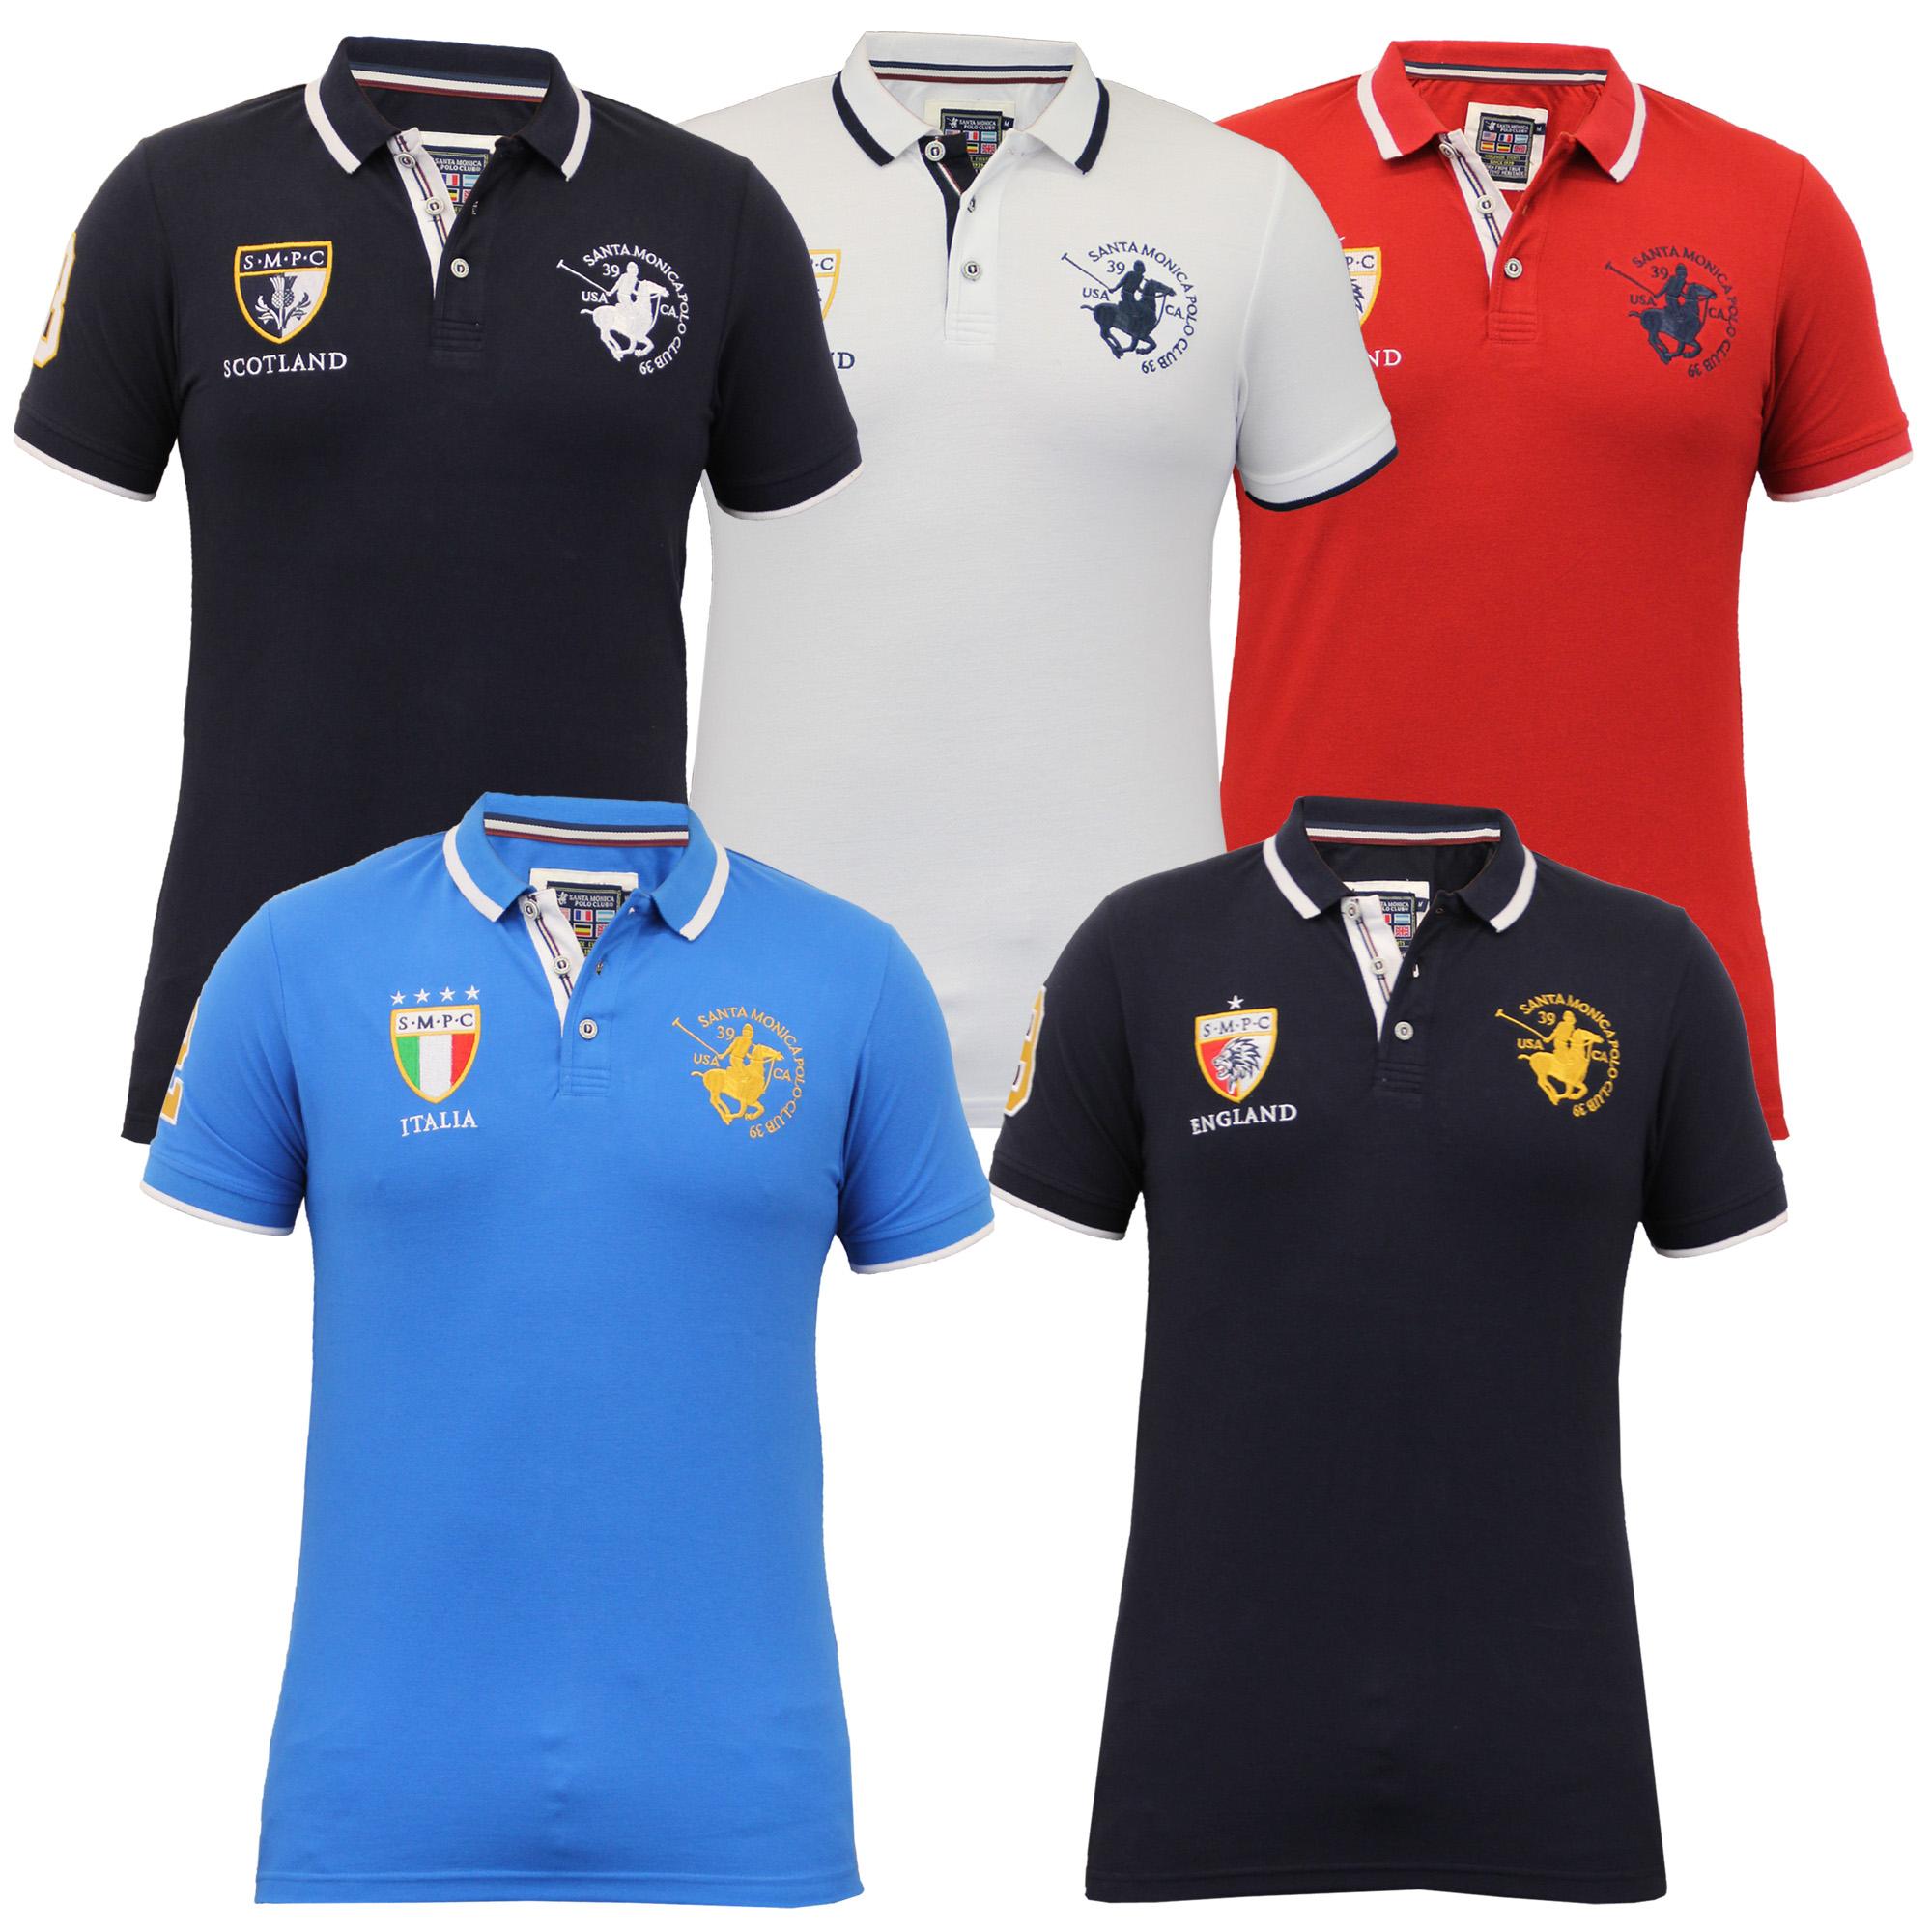 Mens Euro Football England Short Sleeved Pique Polo Shirts By Santa ... 1acec0f72faef